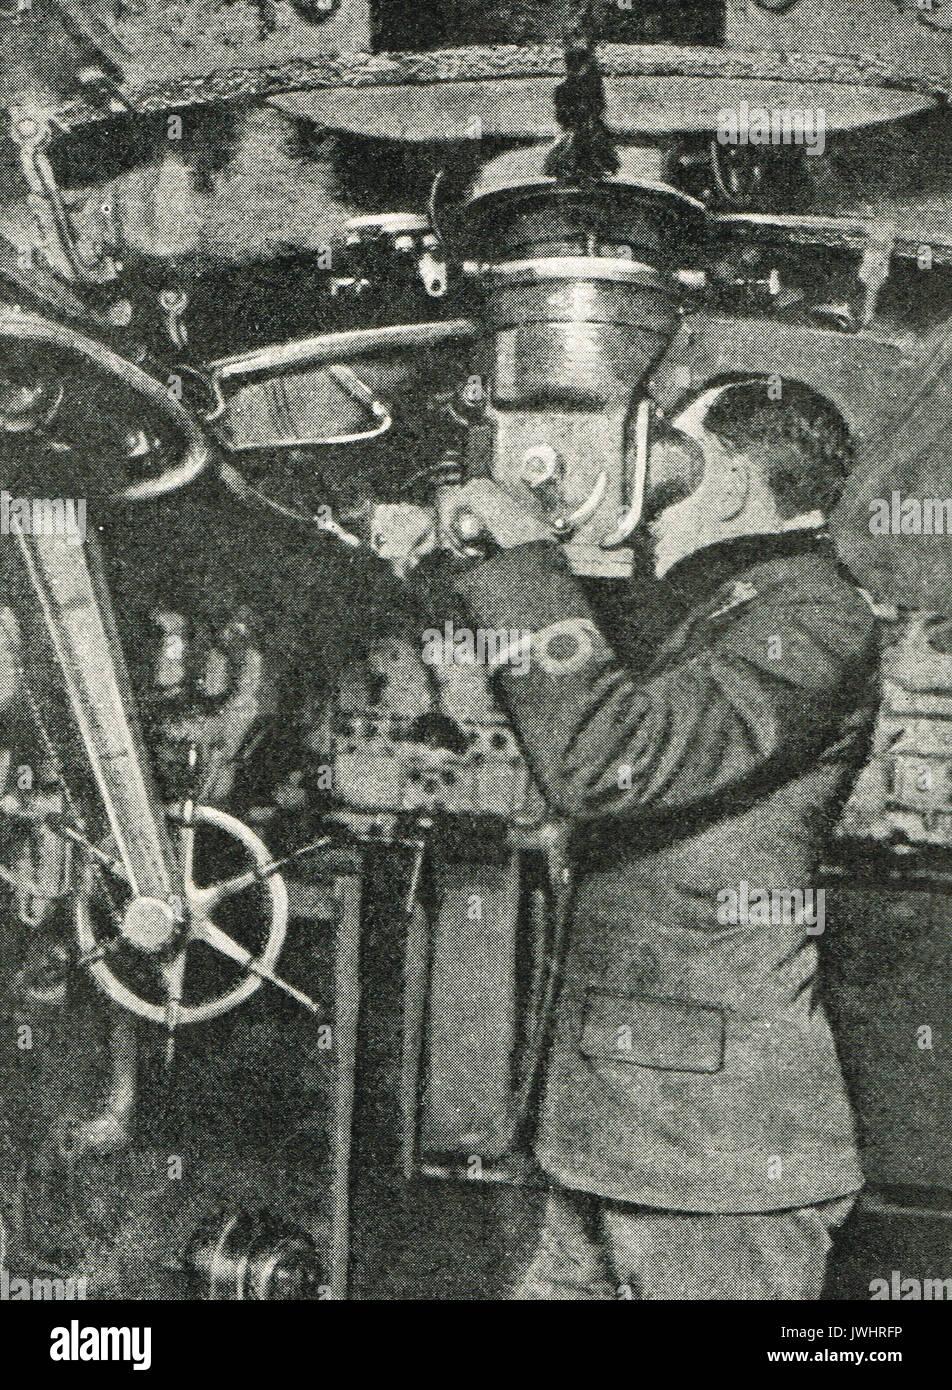 German officer using periscope, WW1 - Stock Image